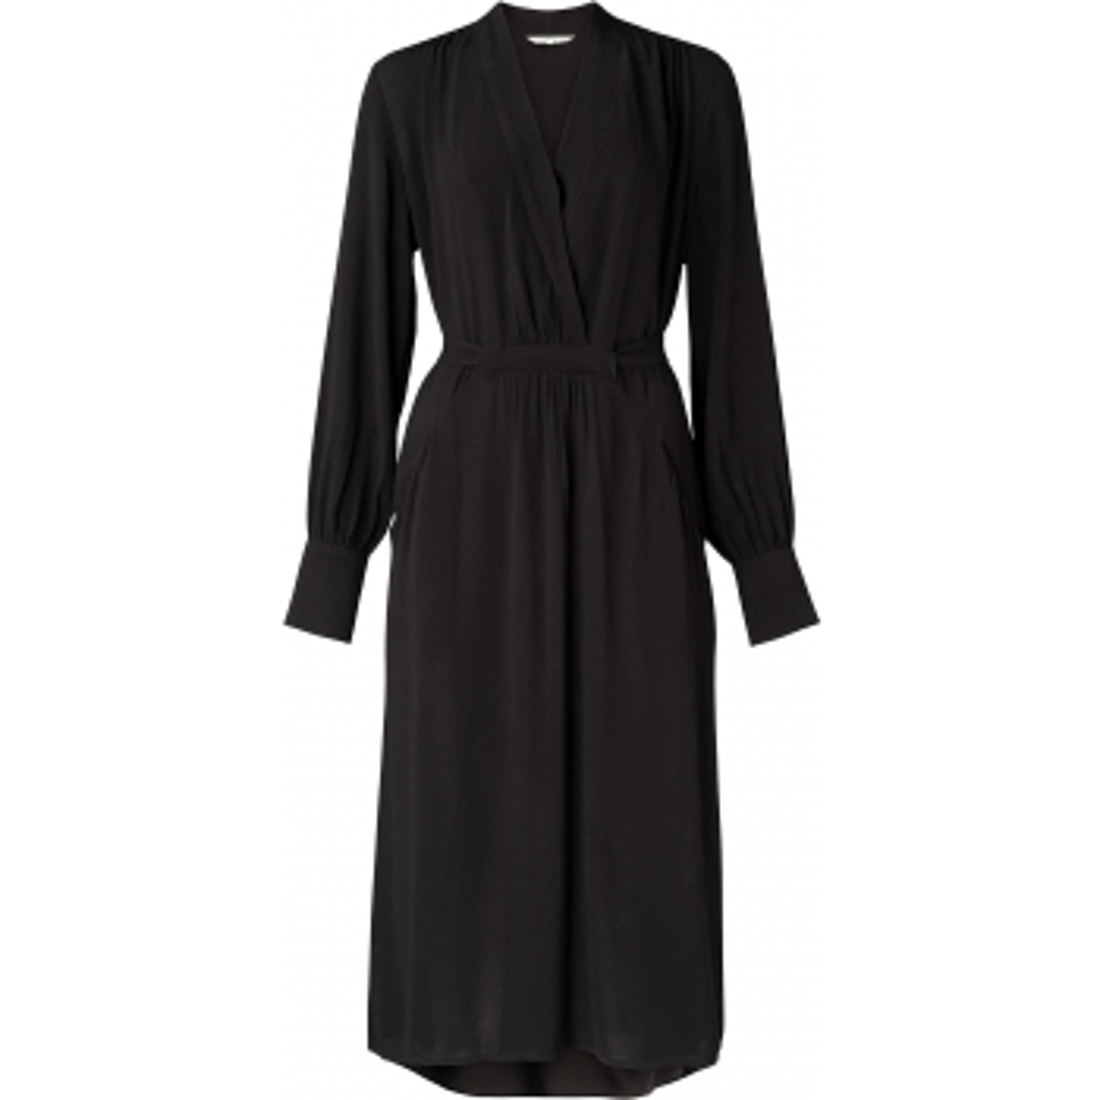 Woven v-neck dress with belt black